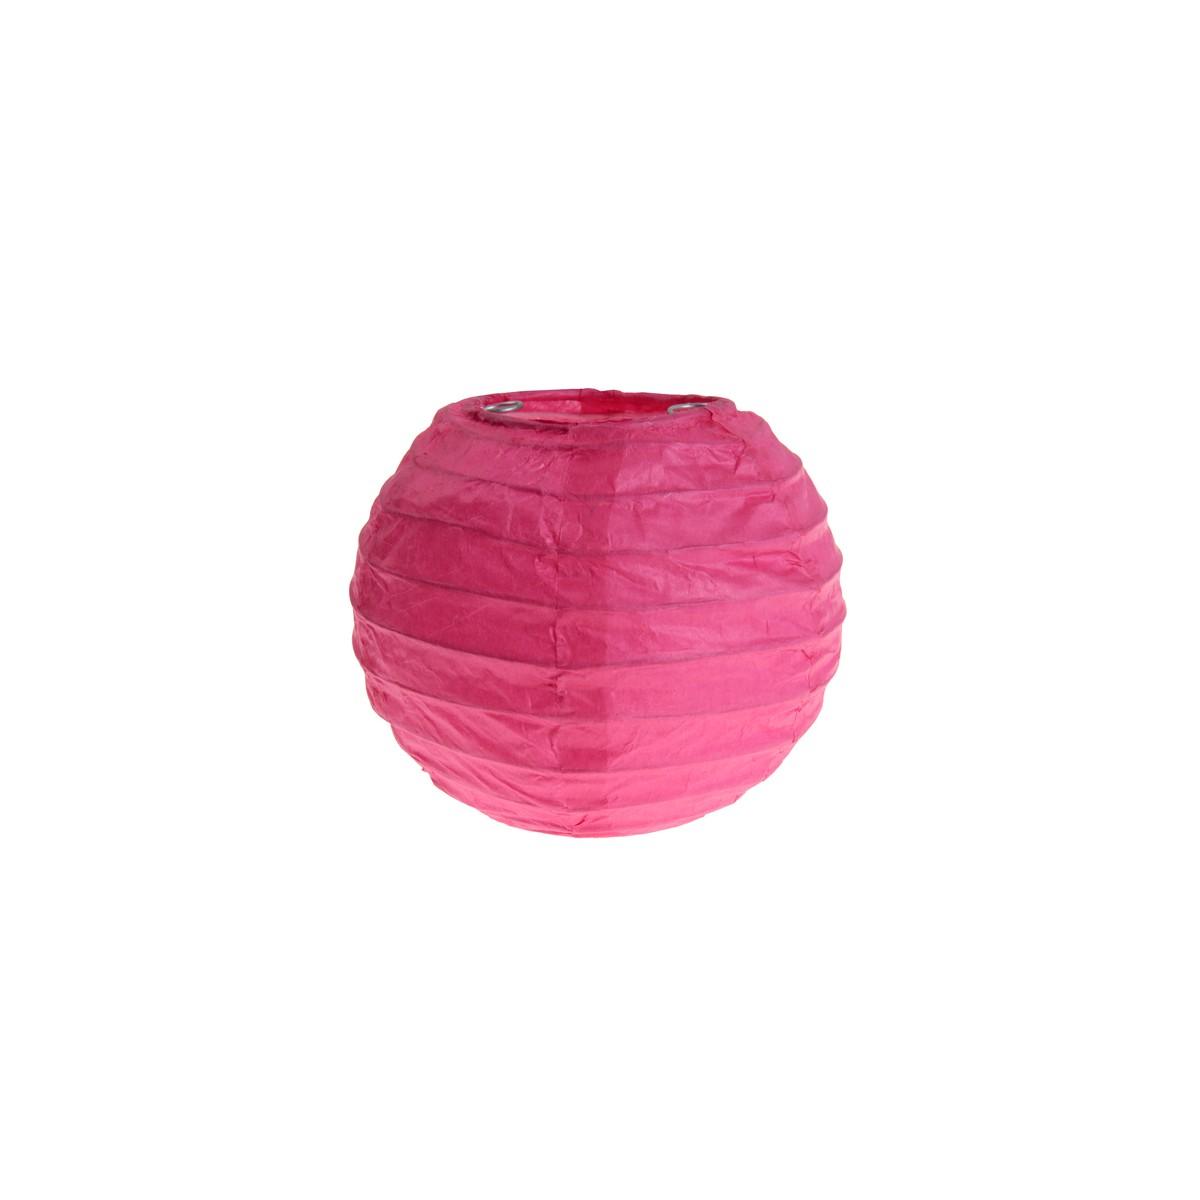 2x Petite Lanterne Papier 10cm - Fuchsia